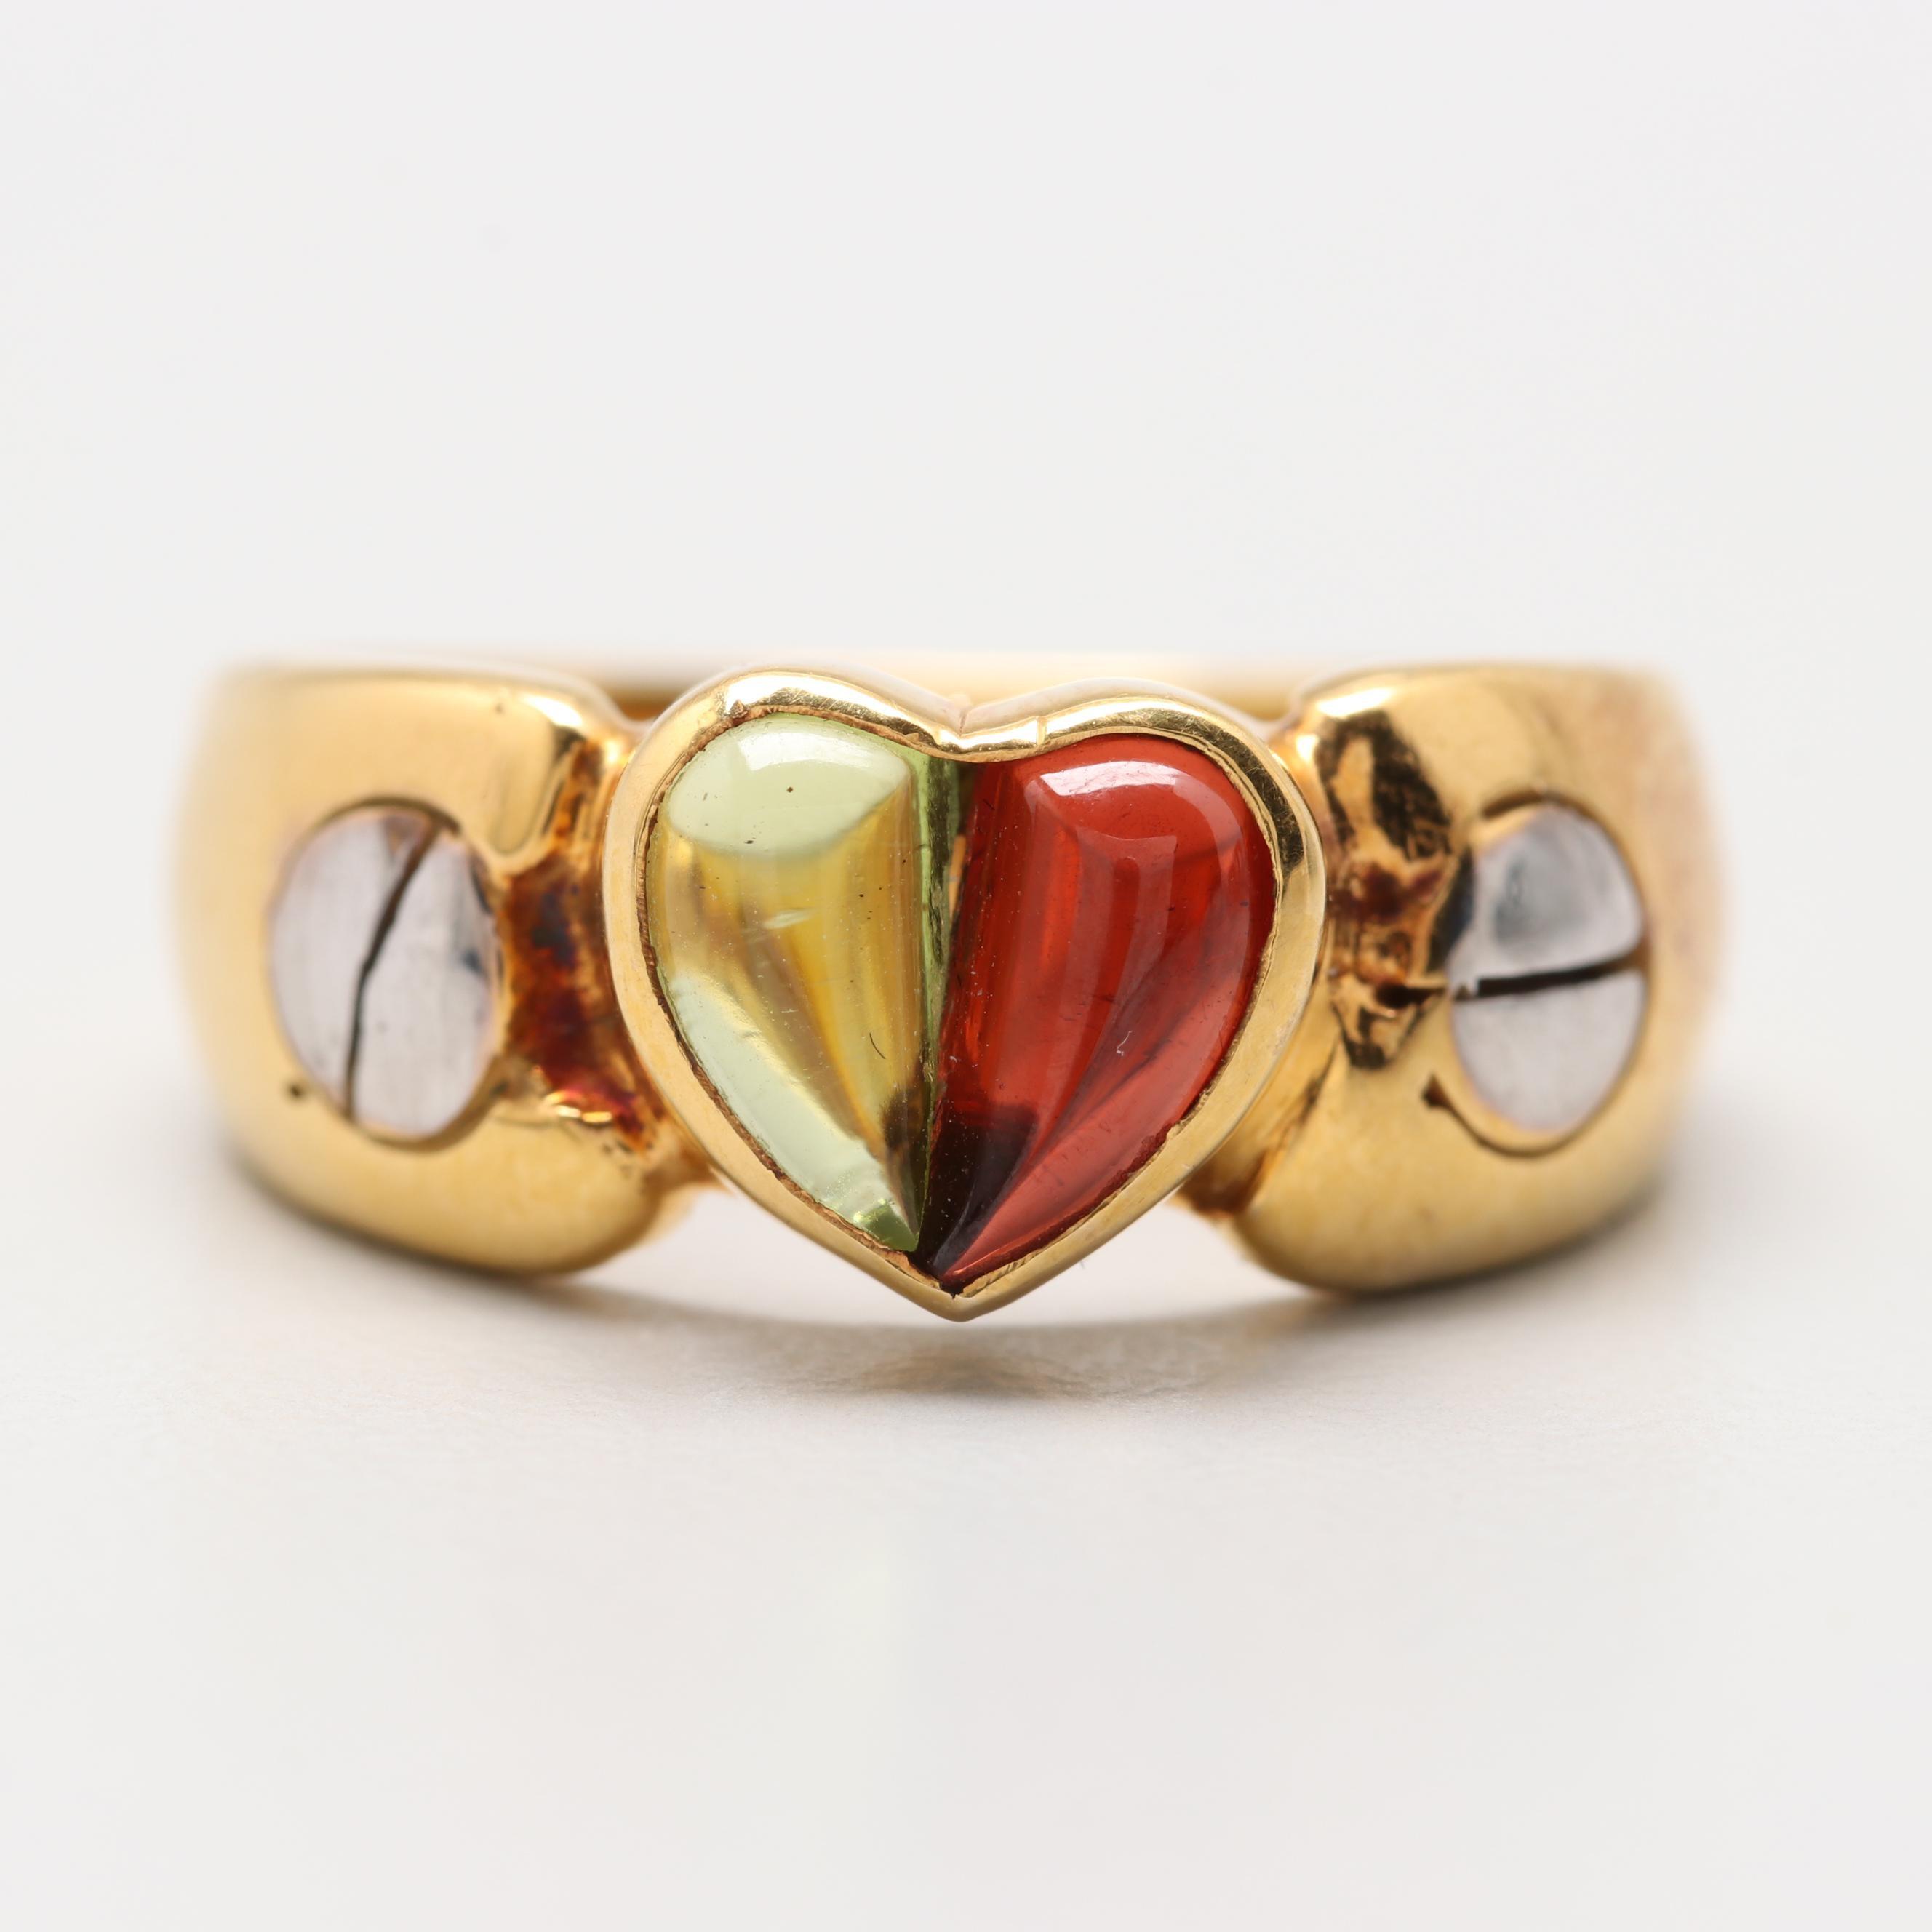 14K Yellow Gold Peridot and Garnet Heart Ring